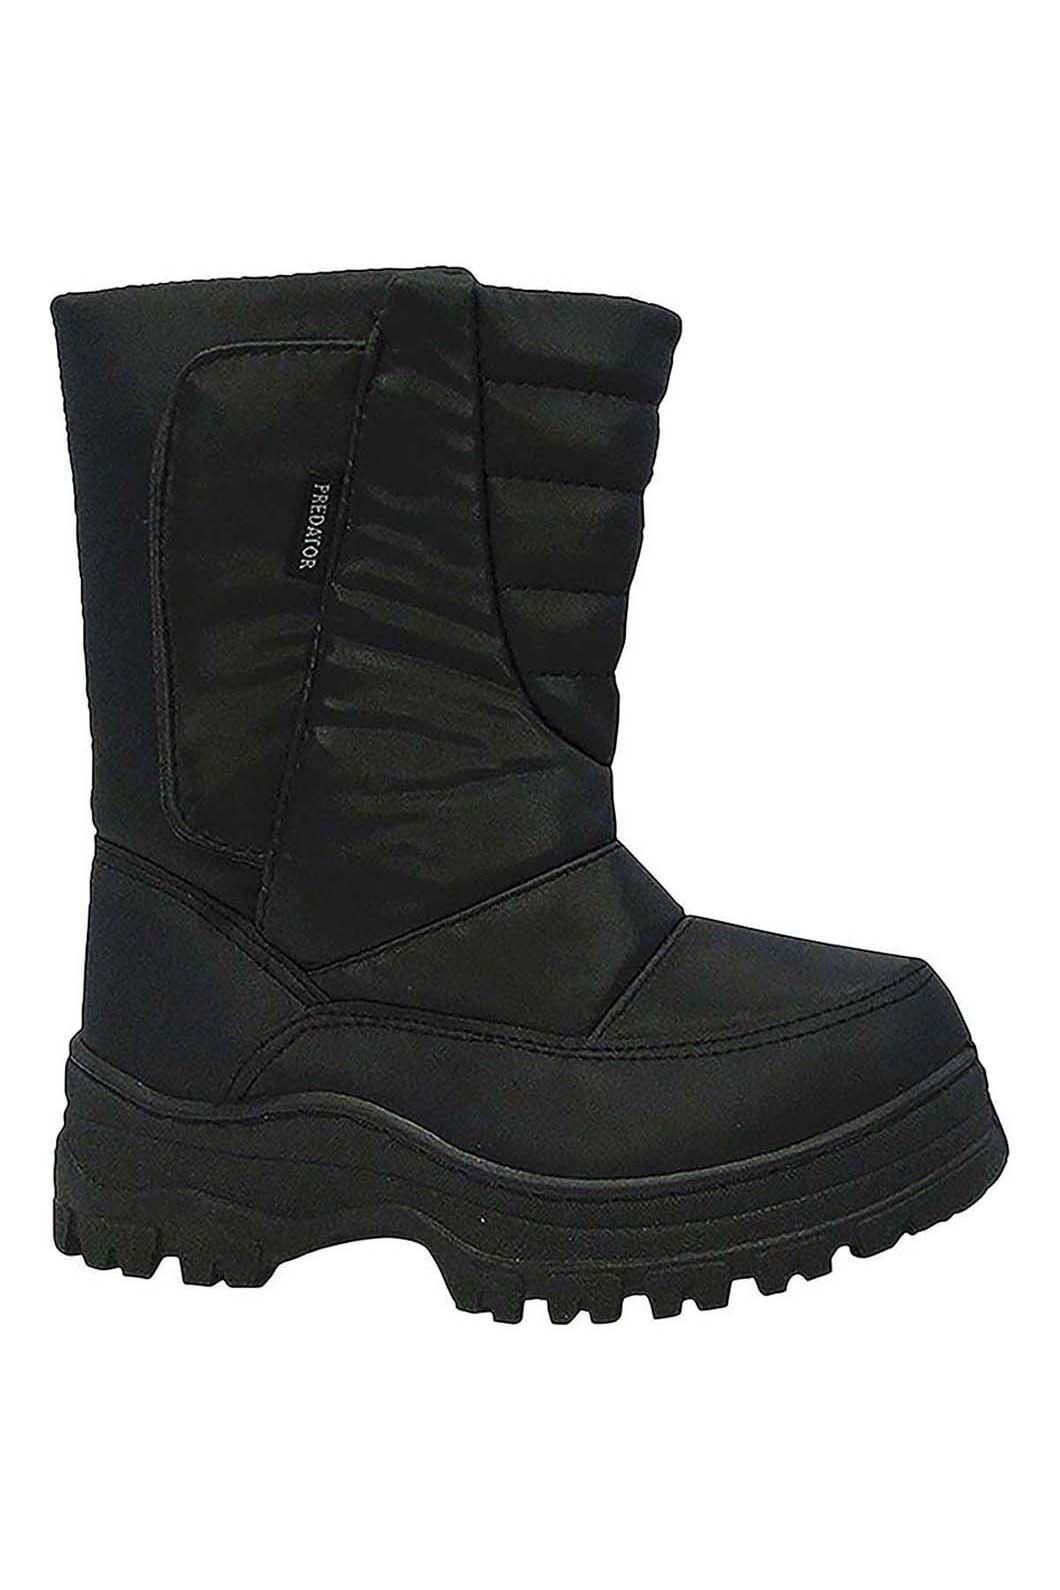 XTM Women's Predator Snow Boots, Black, hi-res